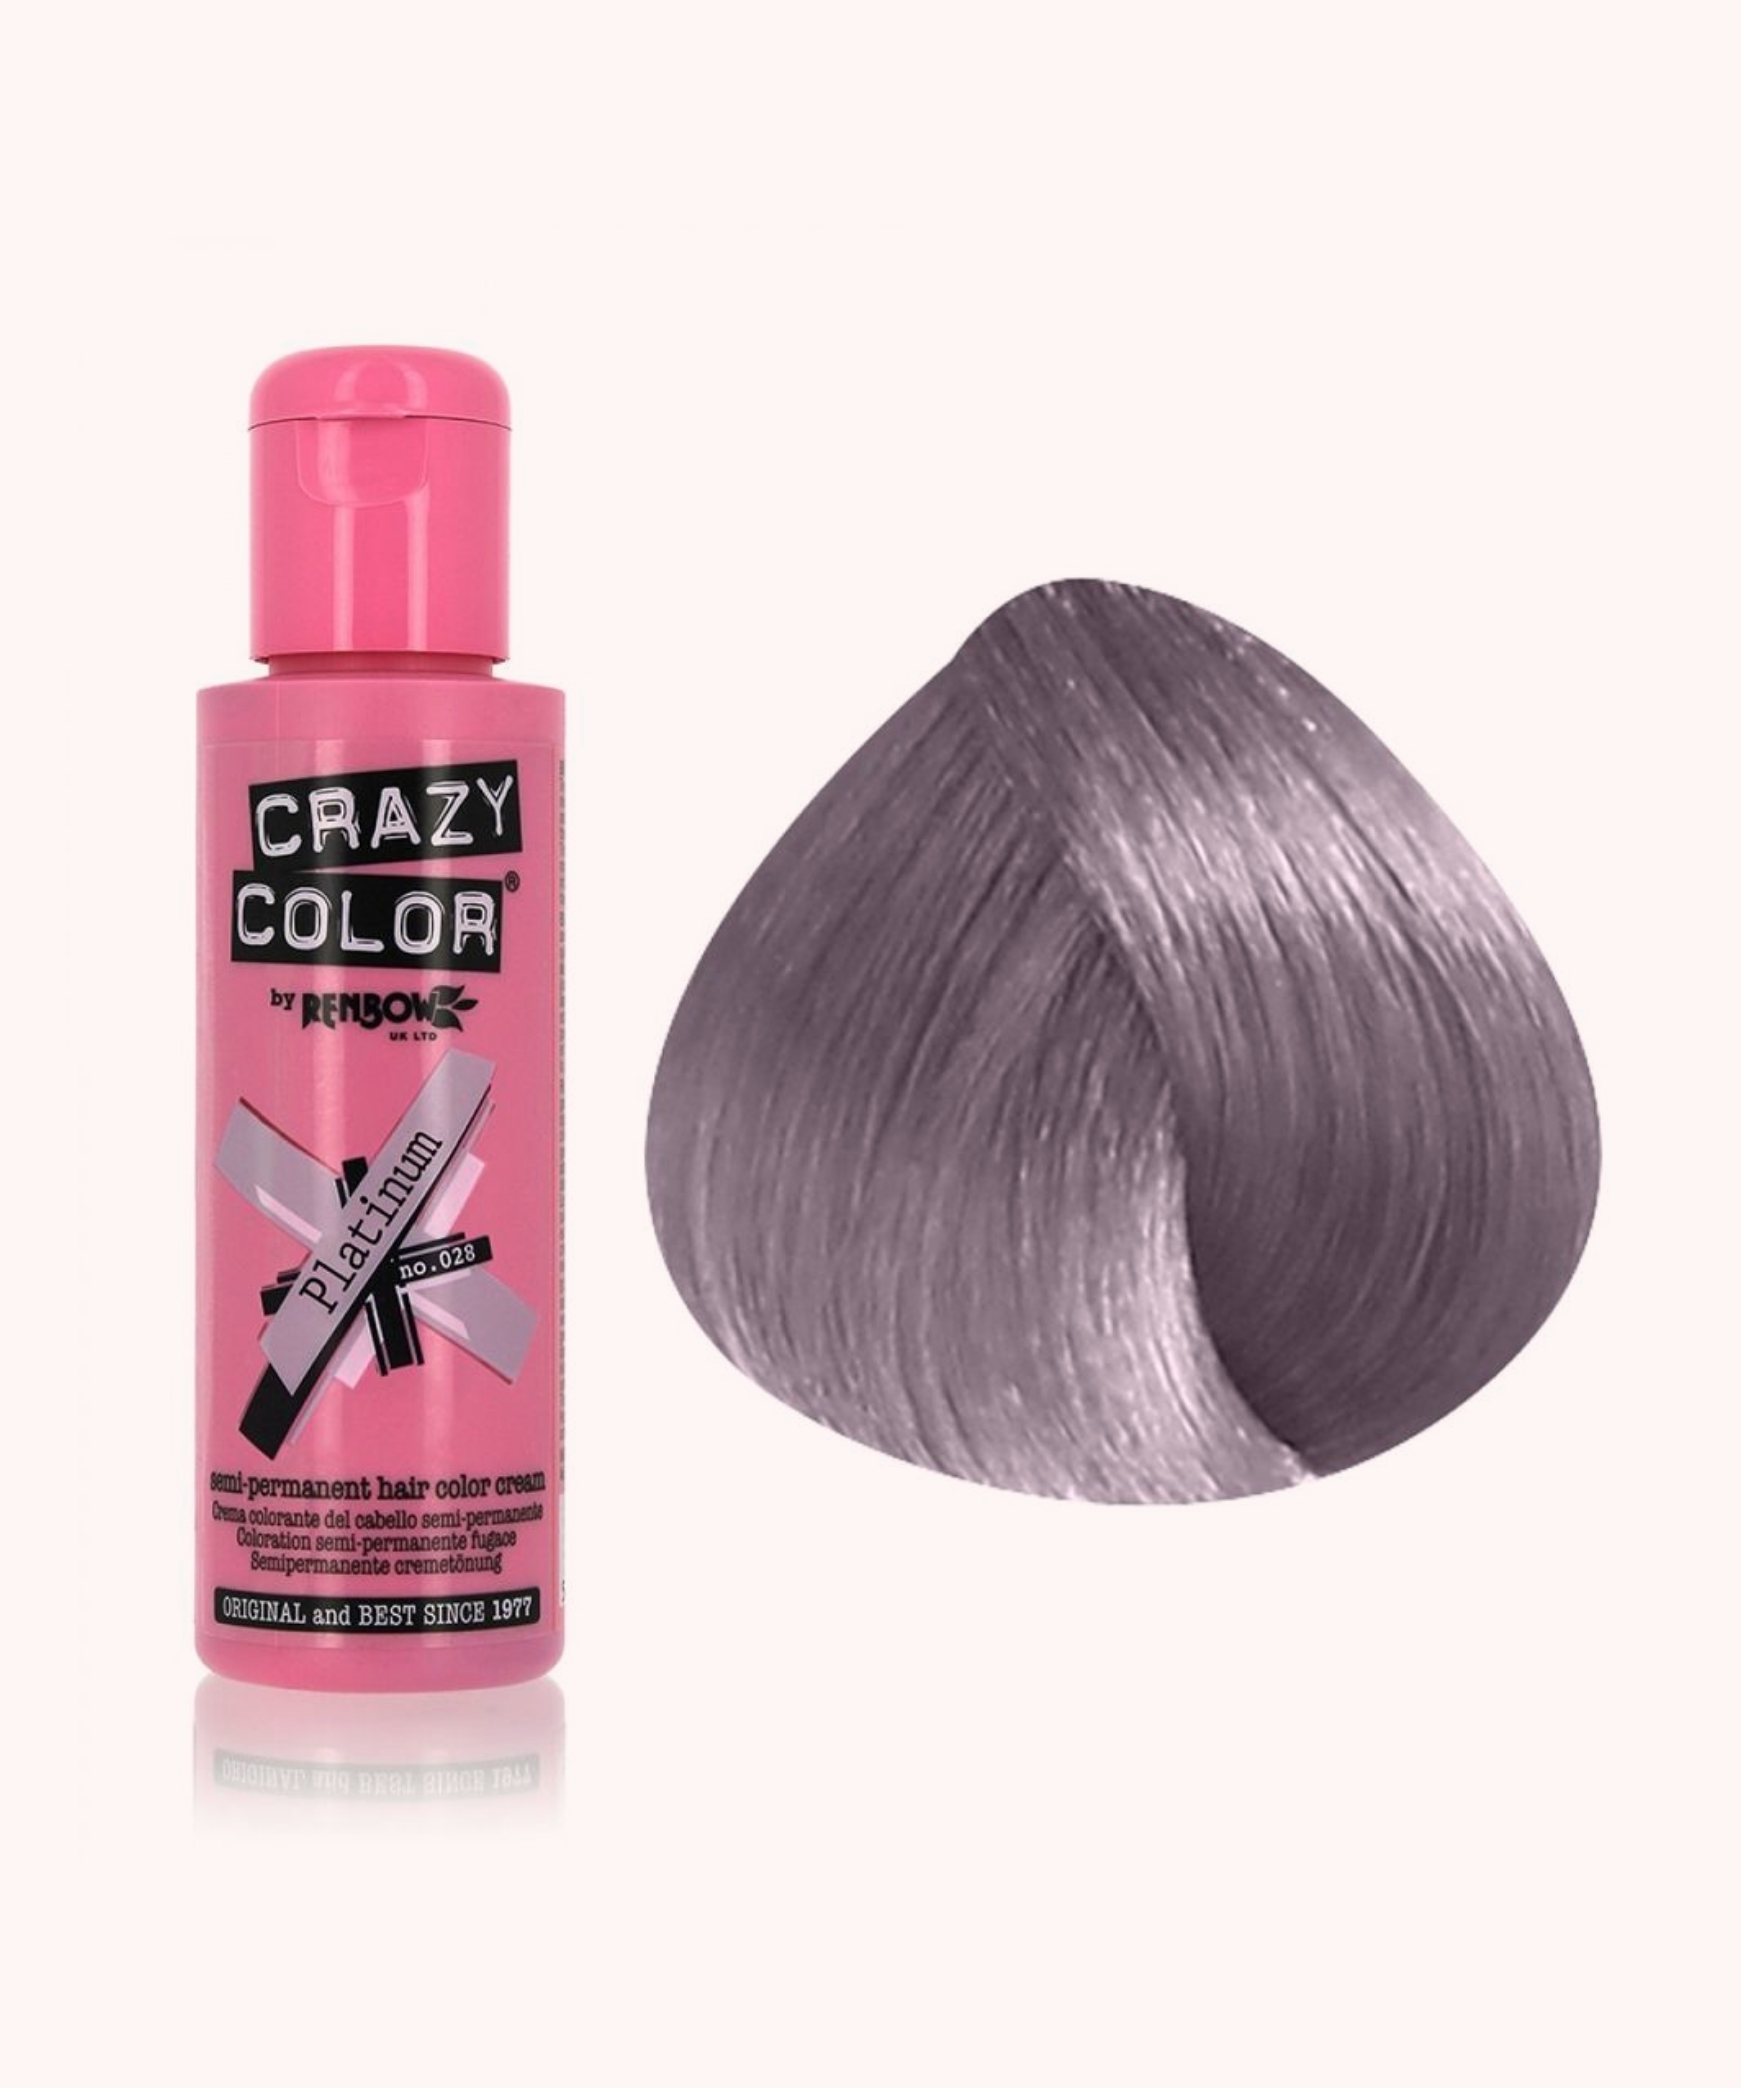 Crazy Color Hair Dye Lure Beauty